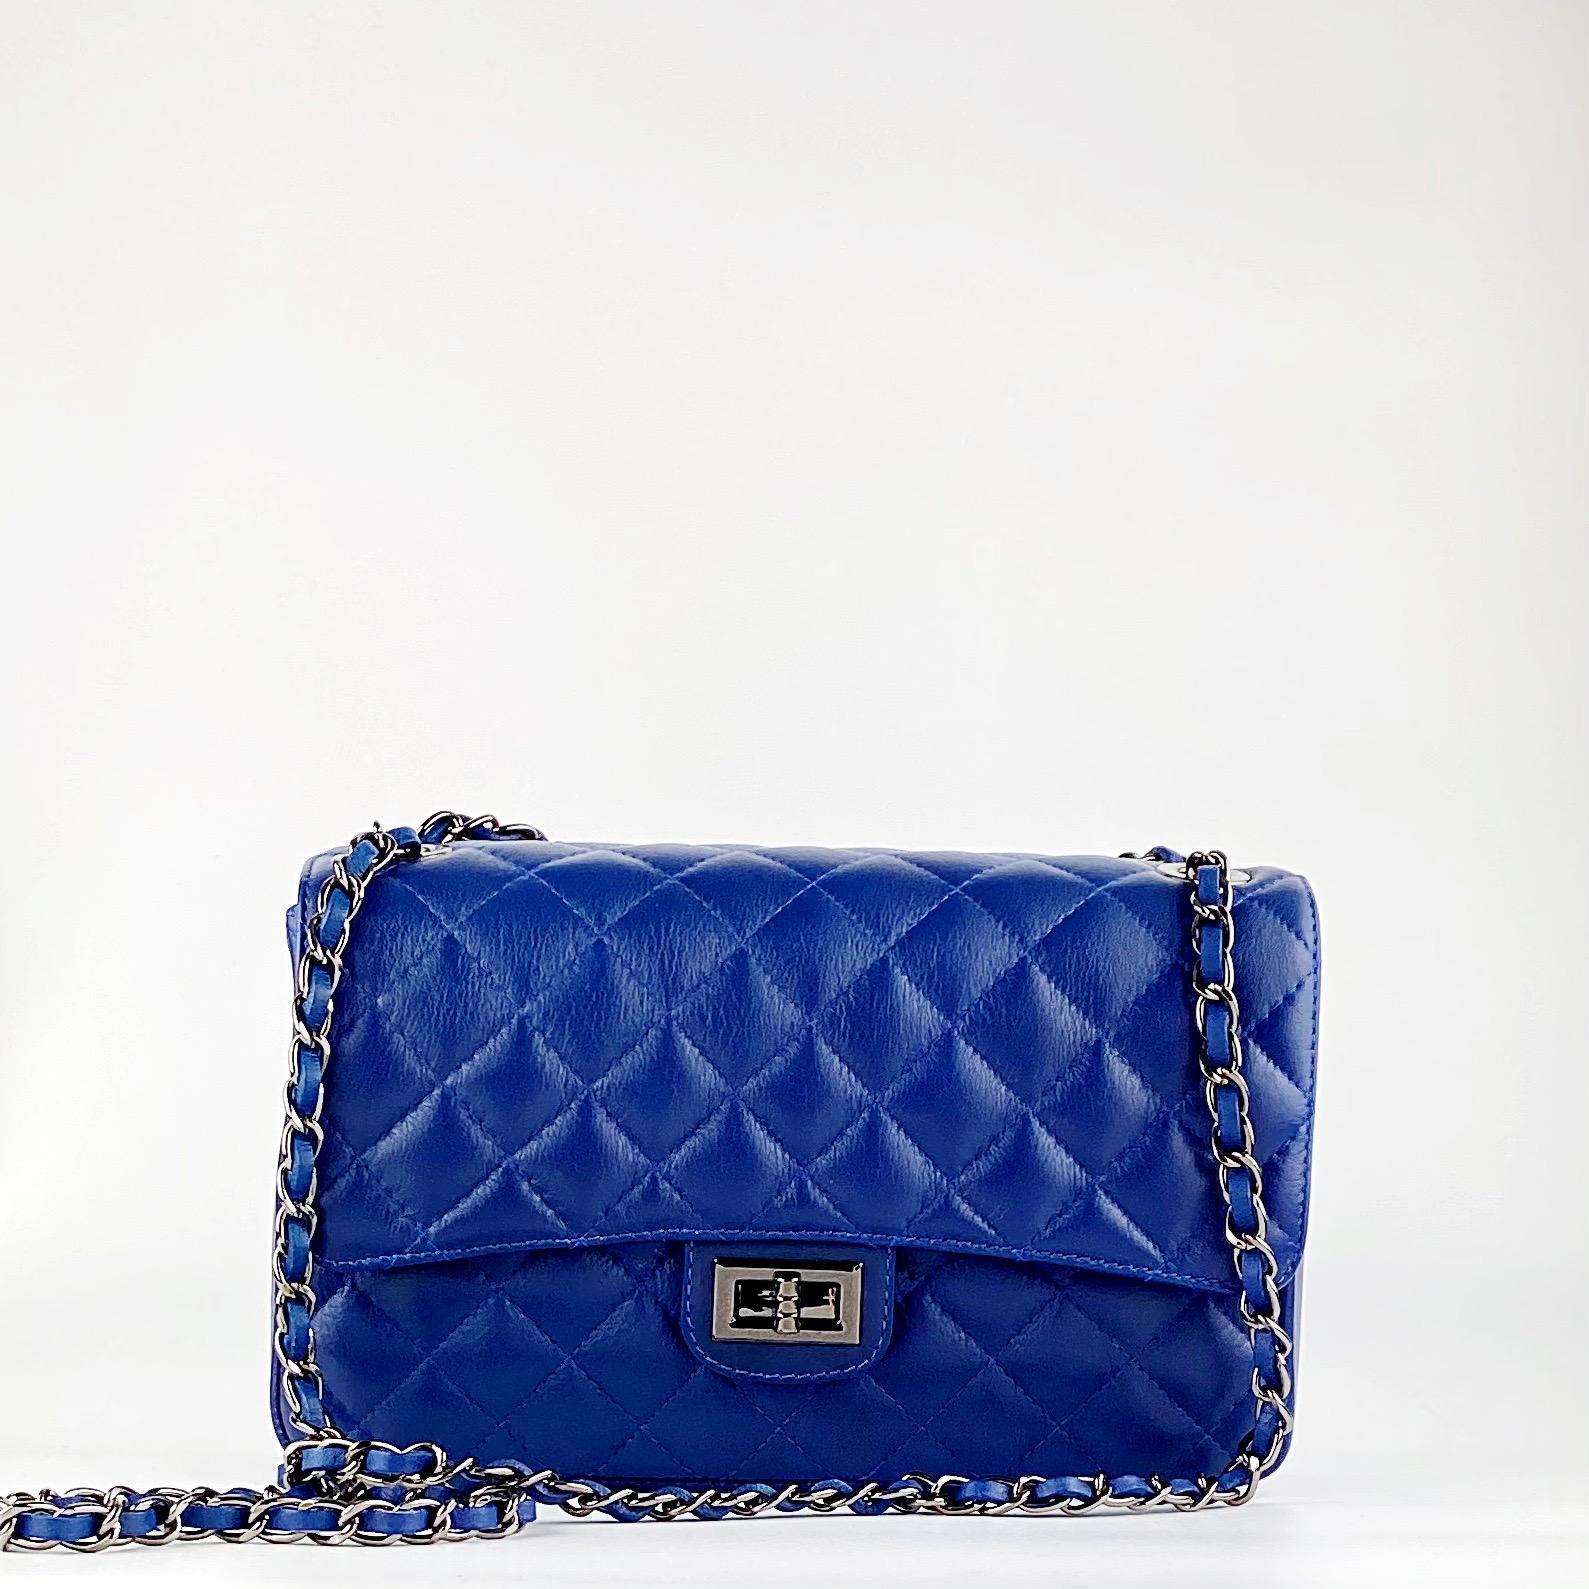 B. acolch clasic  azul Marino c. negra